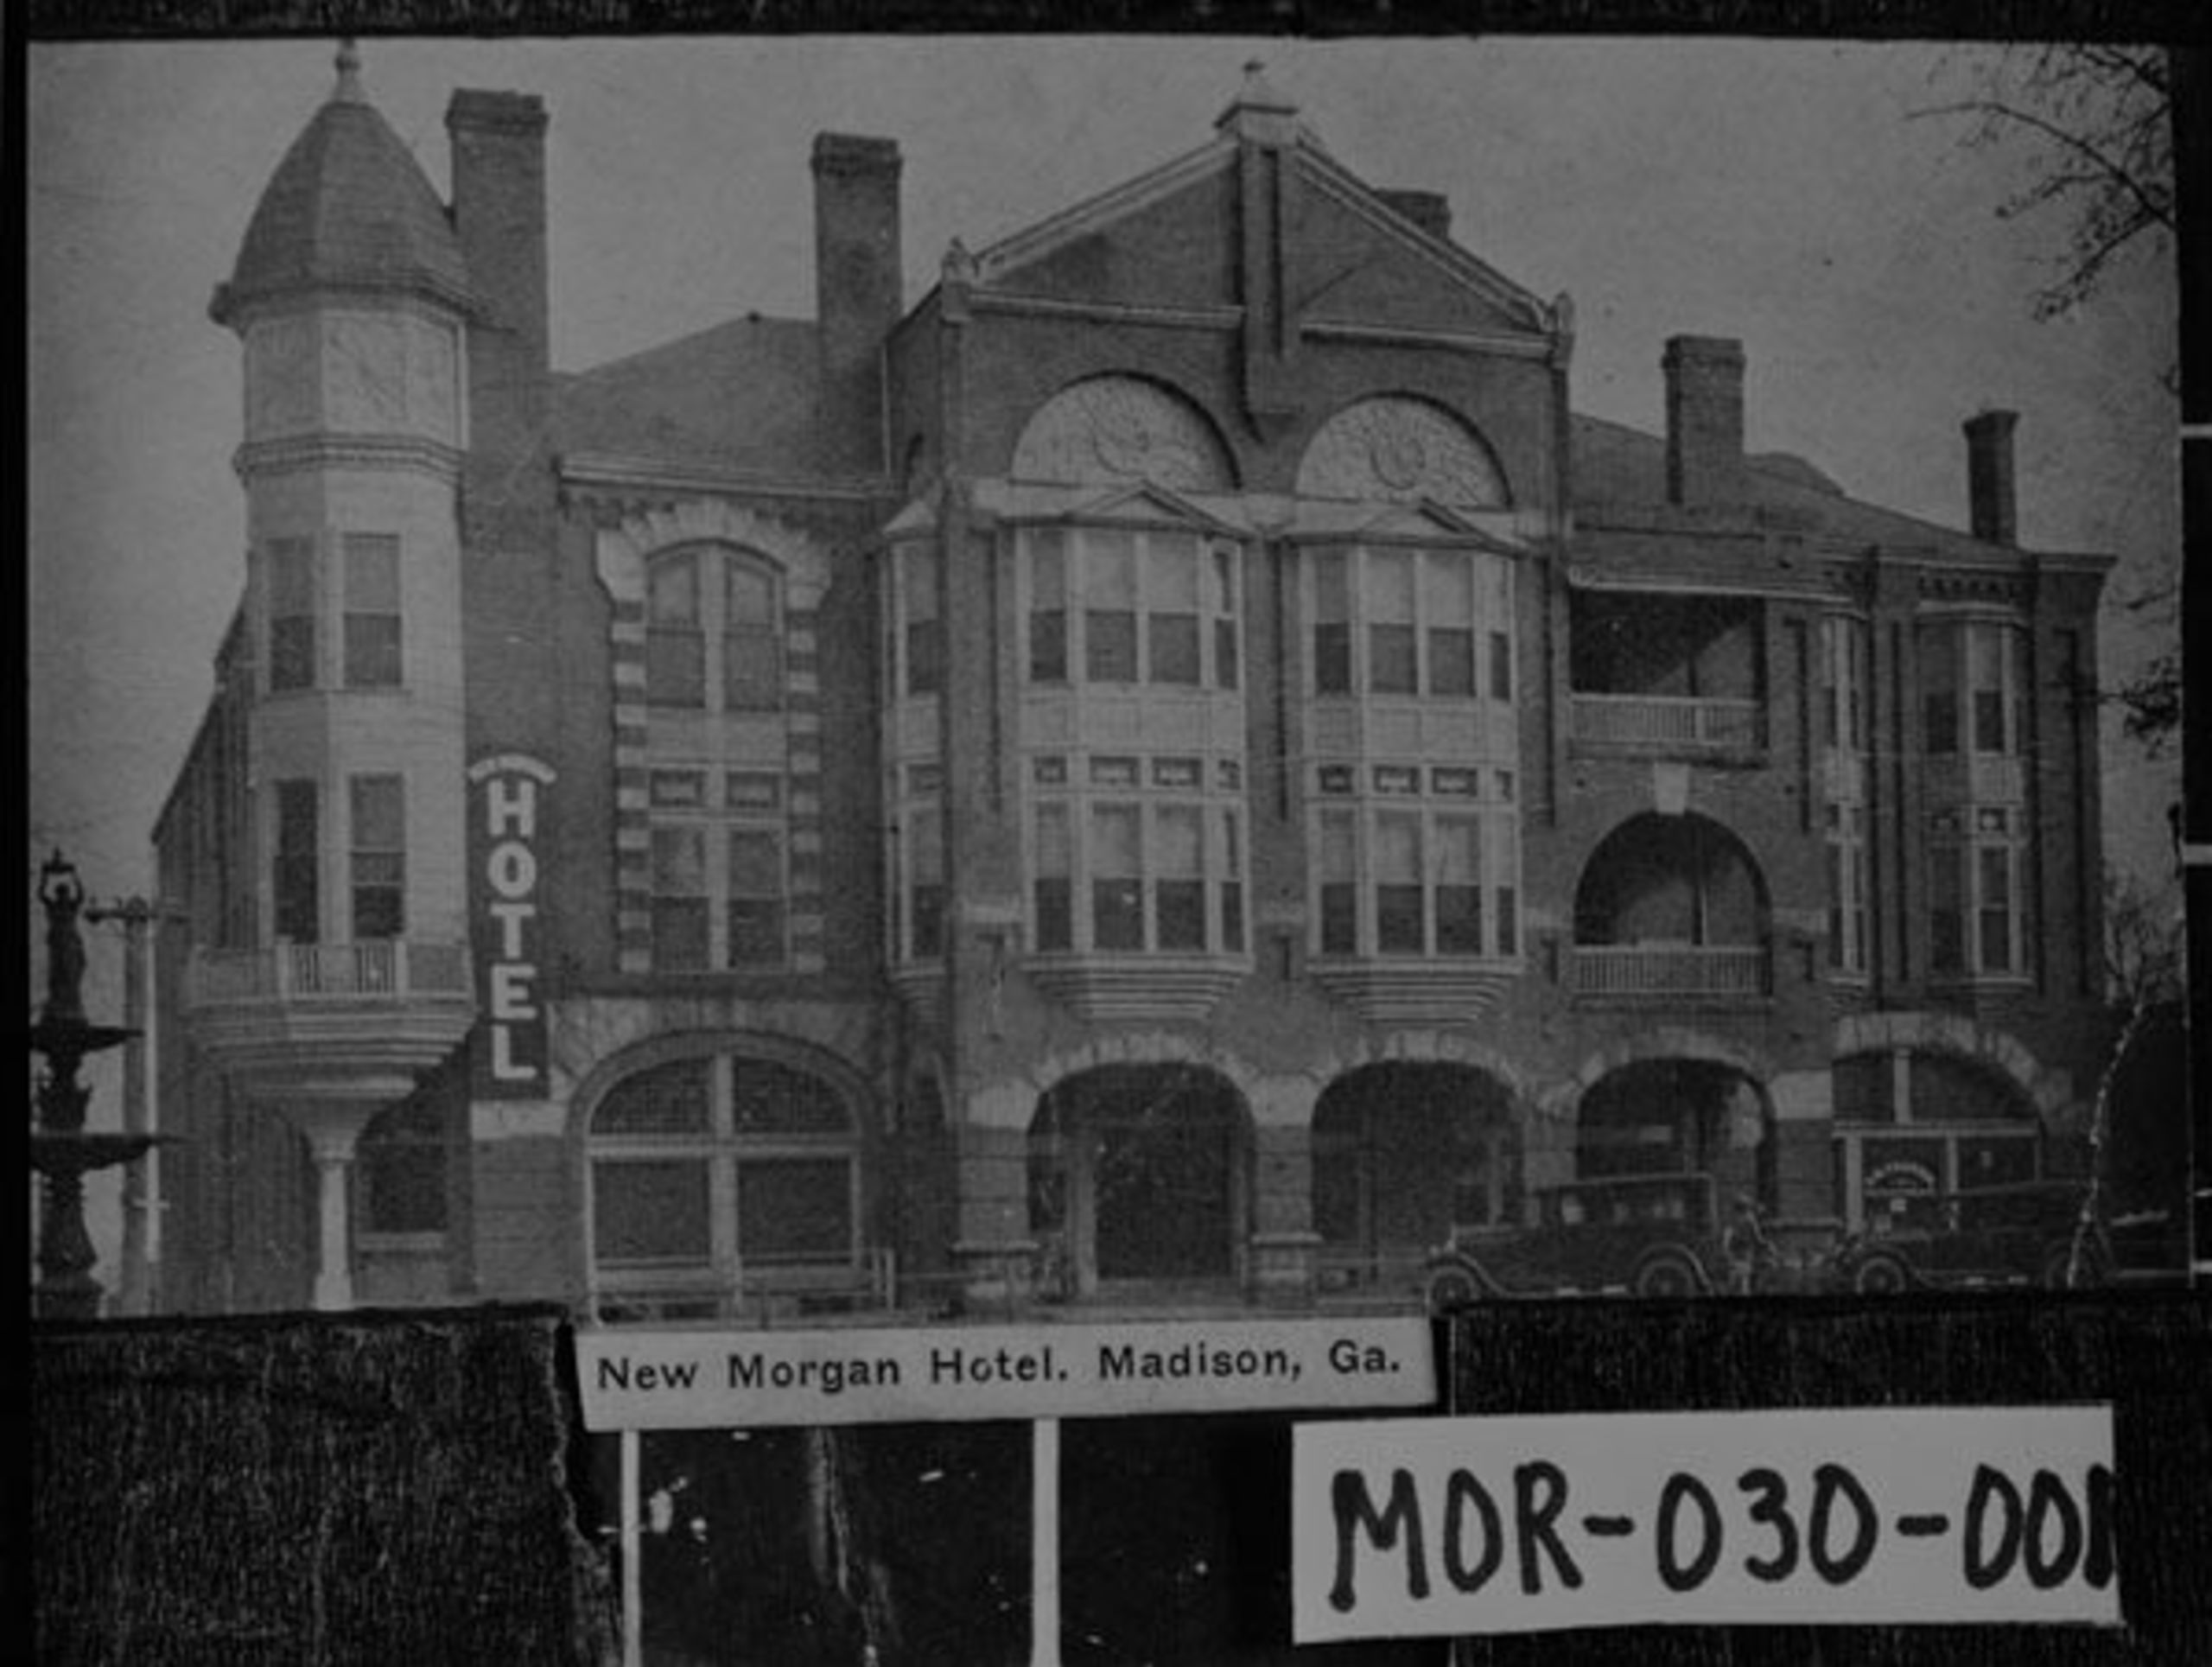 Commercial Property |  Historic Madison,Georgia